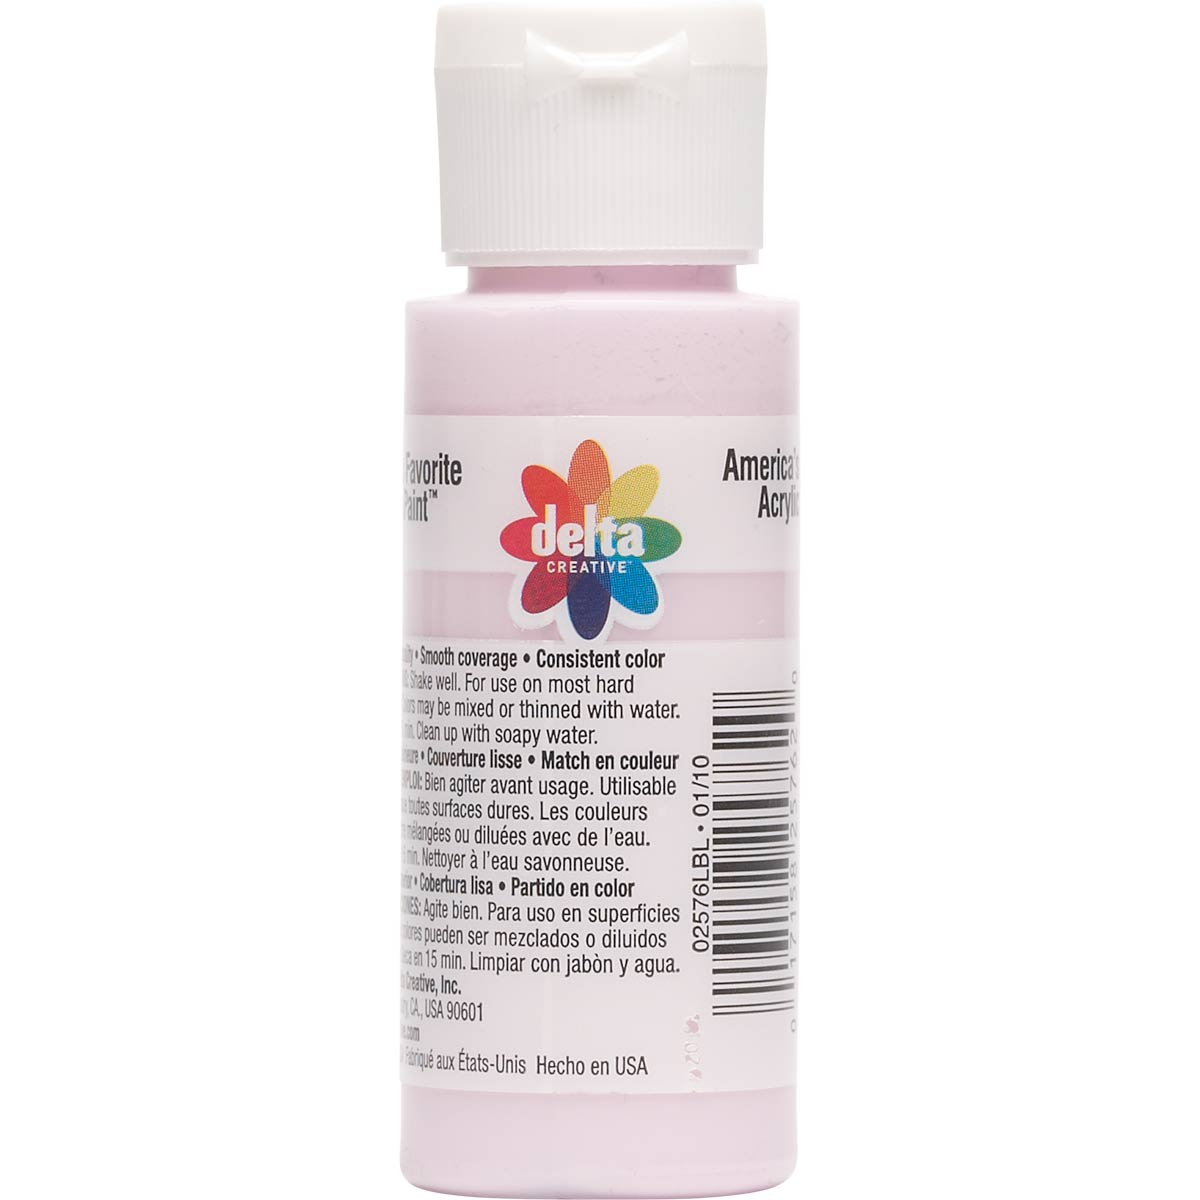 Delta Ceramcoat ® Acrylic Paint - Pale Lilac, 2 oz. - 025760202W